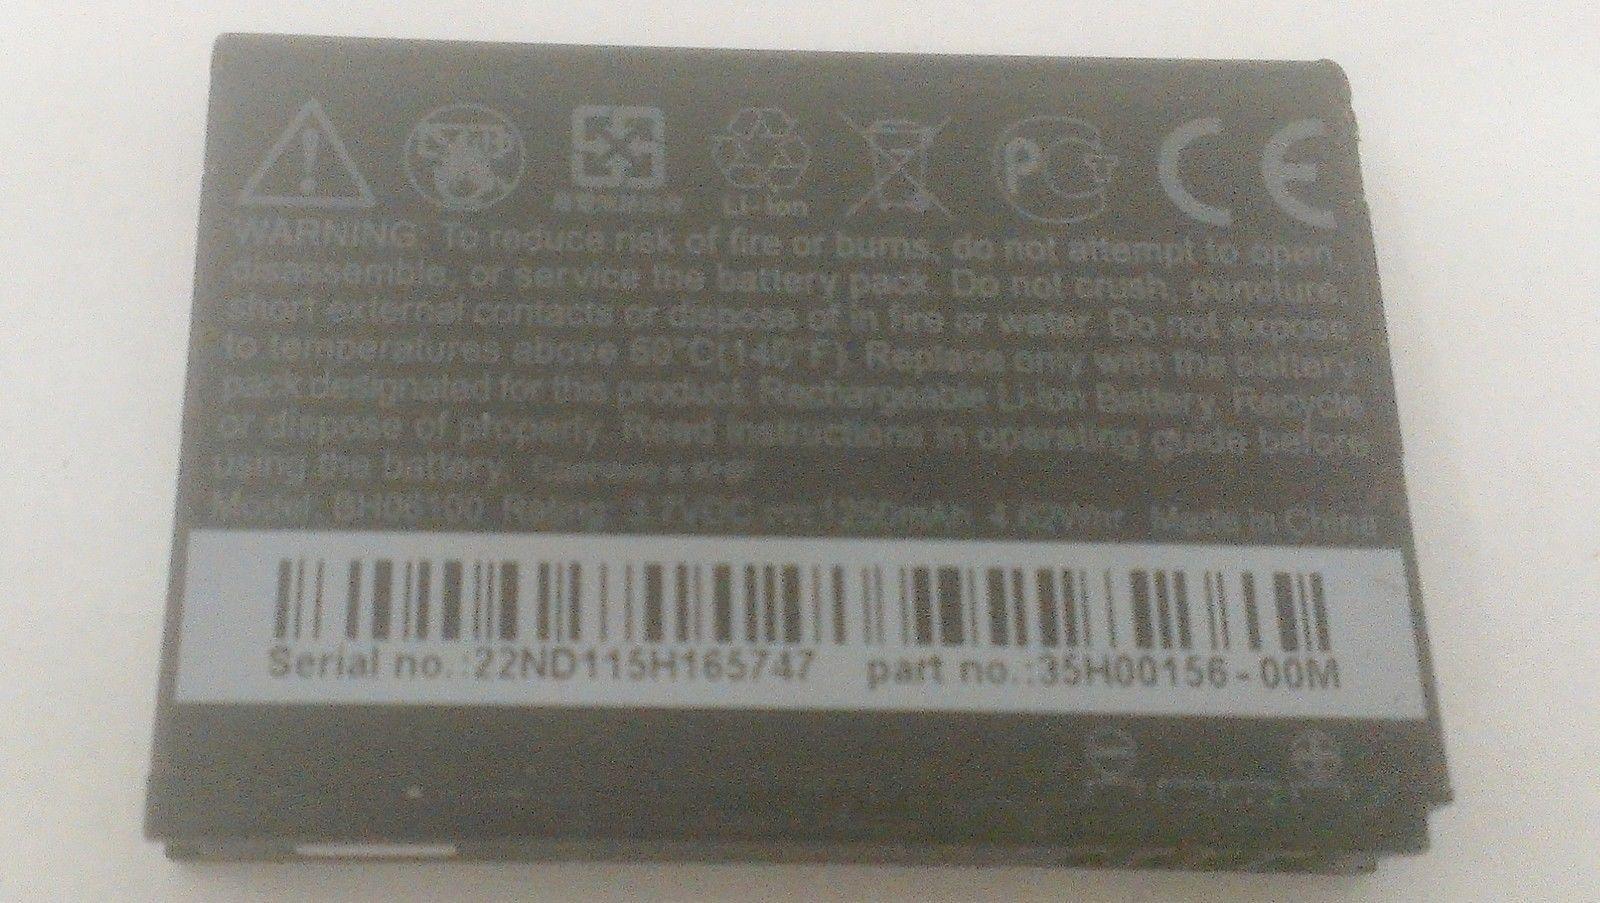 OEM HTC ChaCha / Status BH06100 Standard Battery 1250mAh 35H00156-00M  AT&T